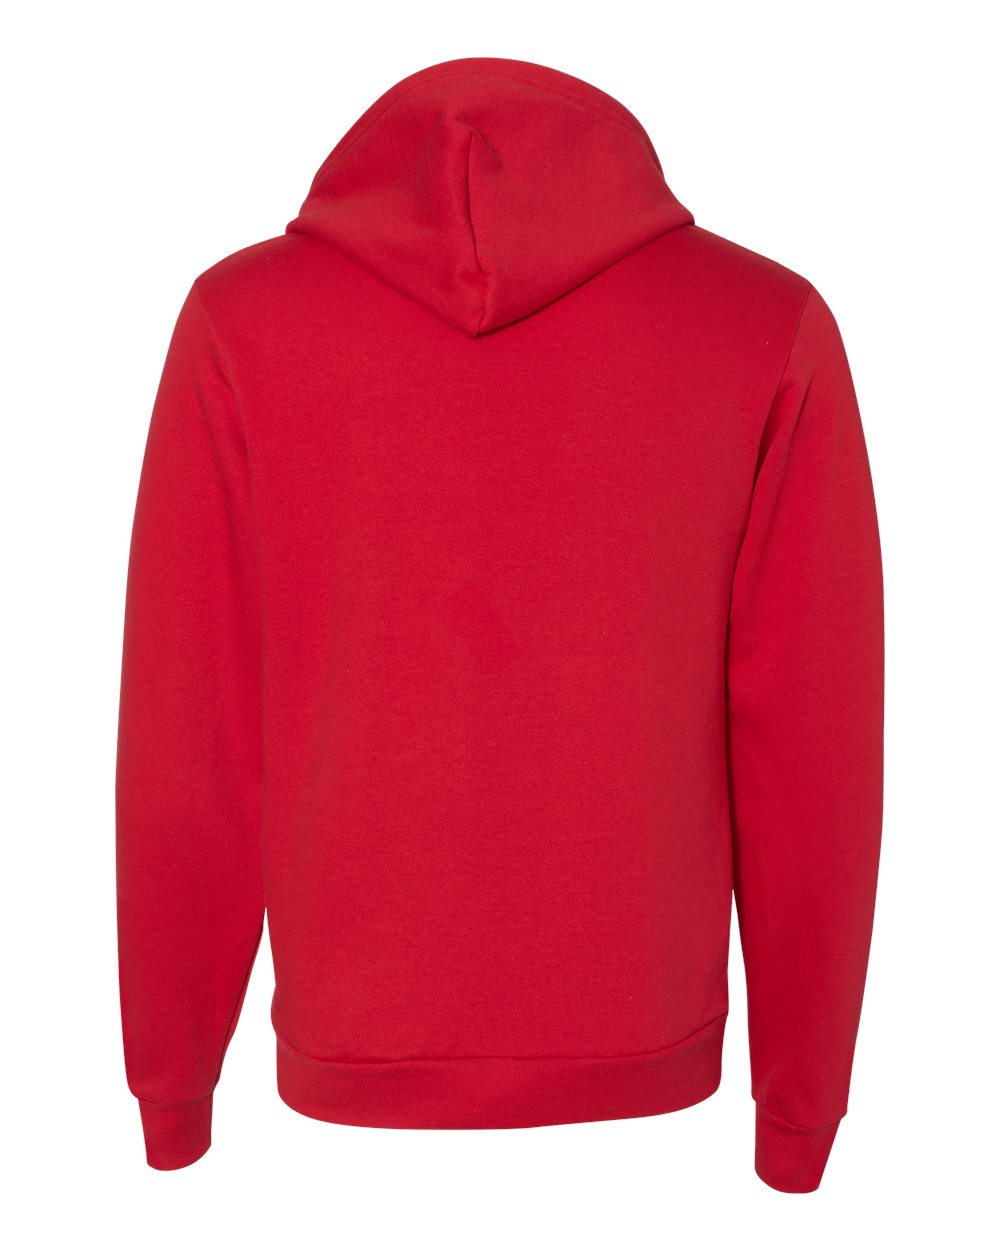 American-Apparel-Flex-Fleece-Unisex-Full-Zip-Hoodie-Blank-F497W-up-to-3XL thumbnail 13